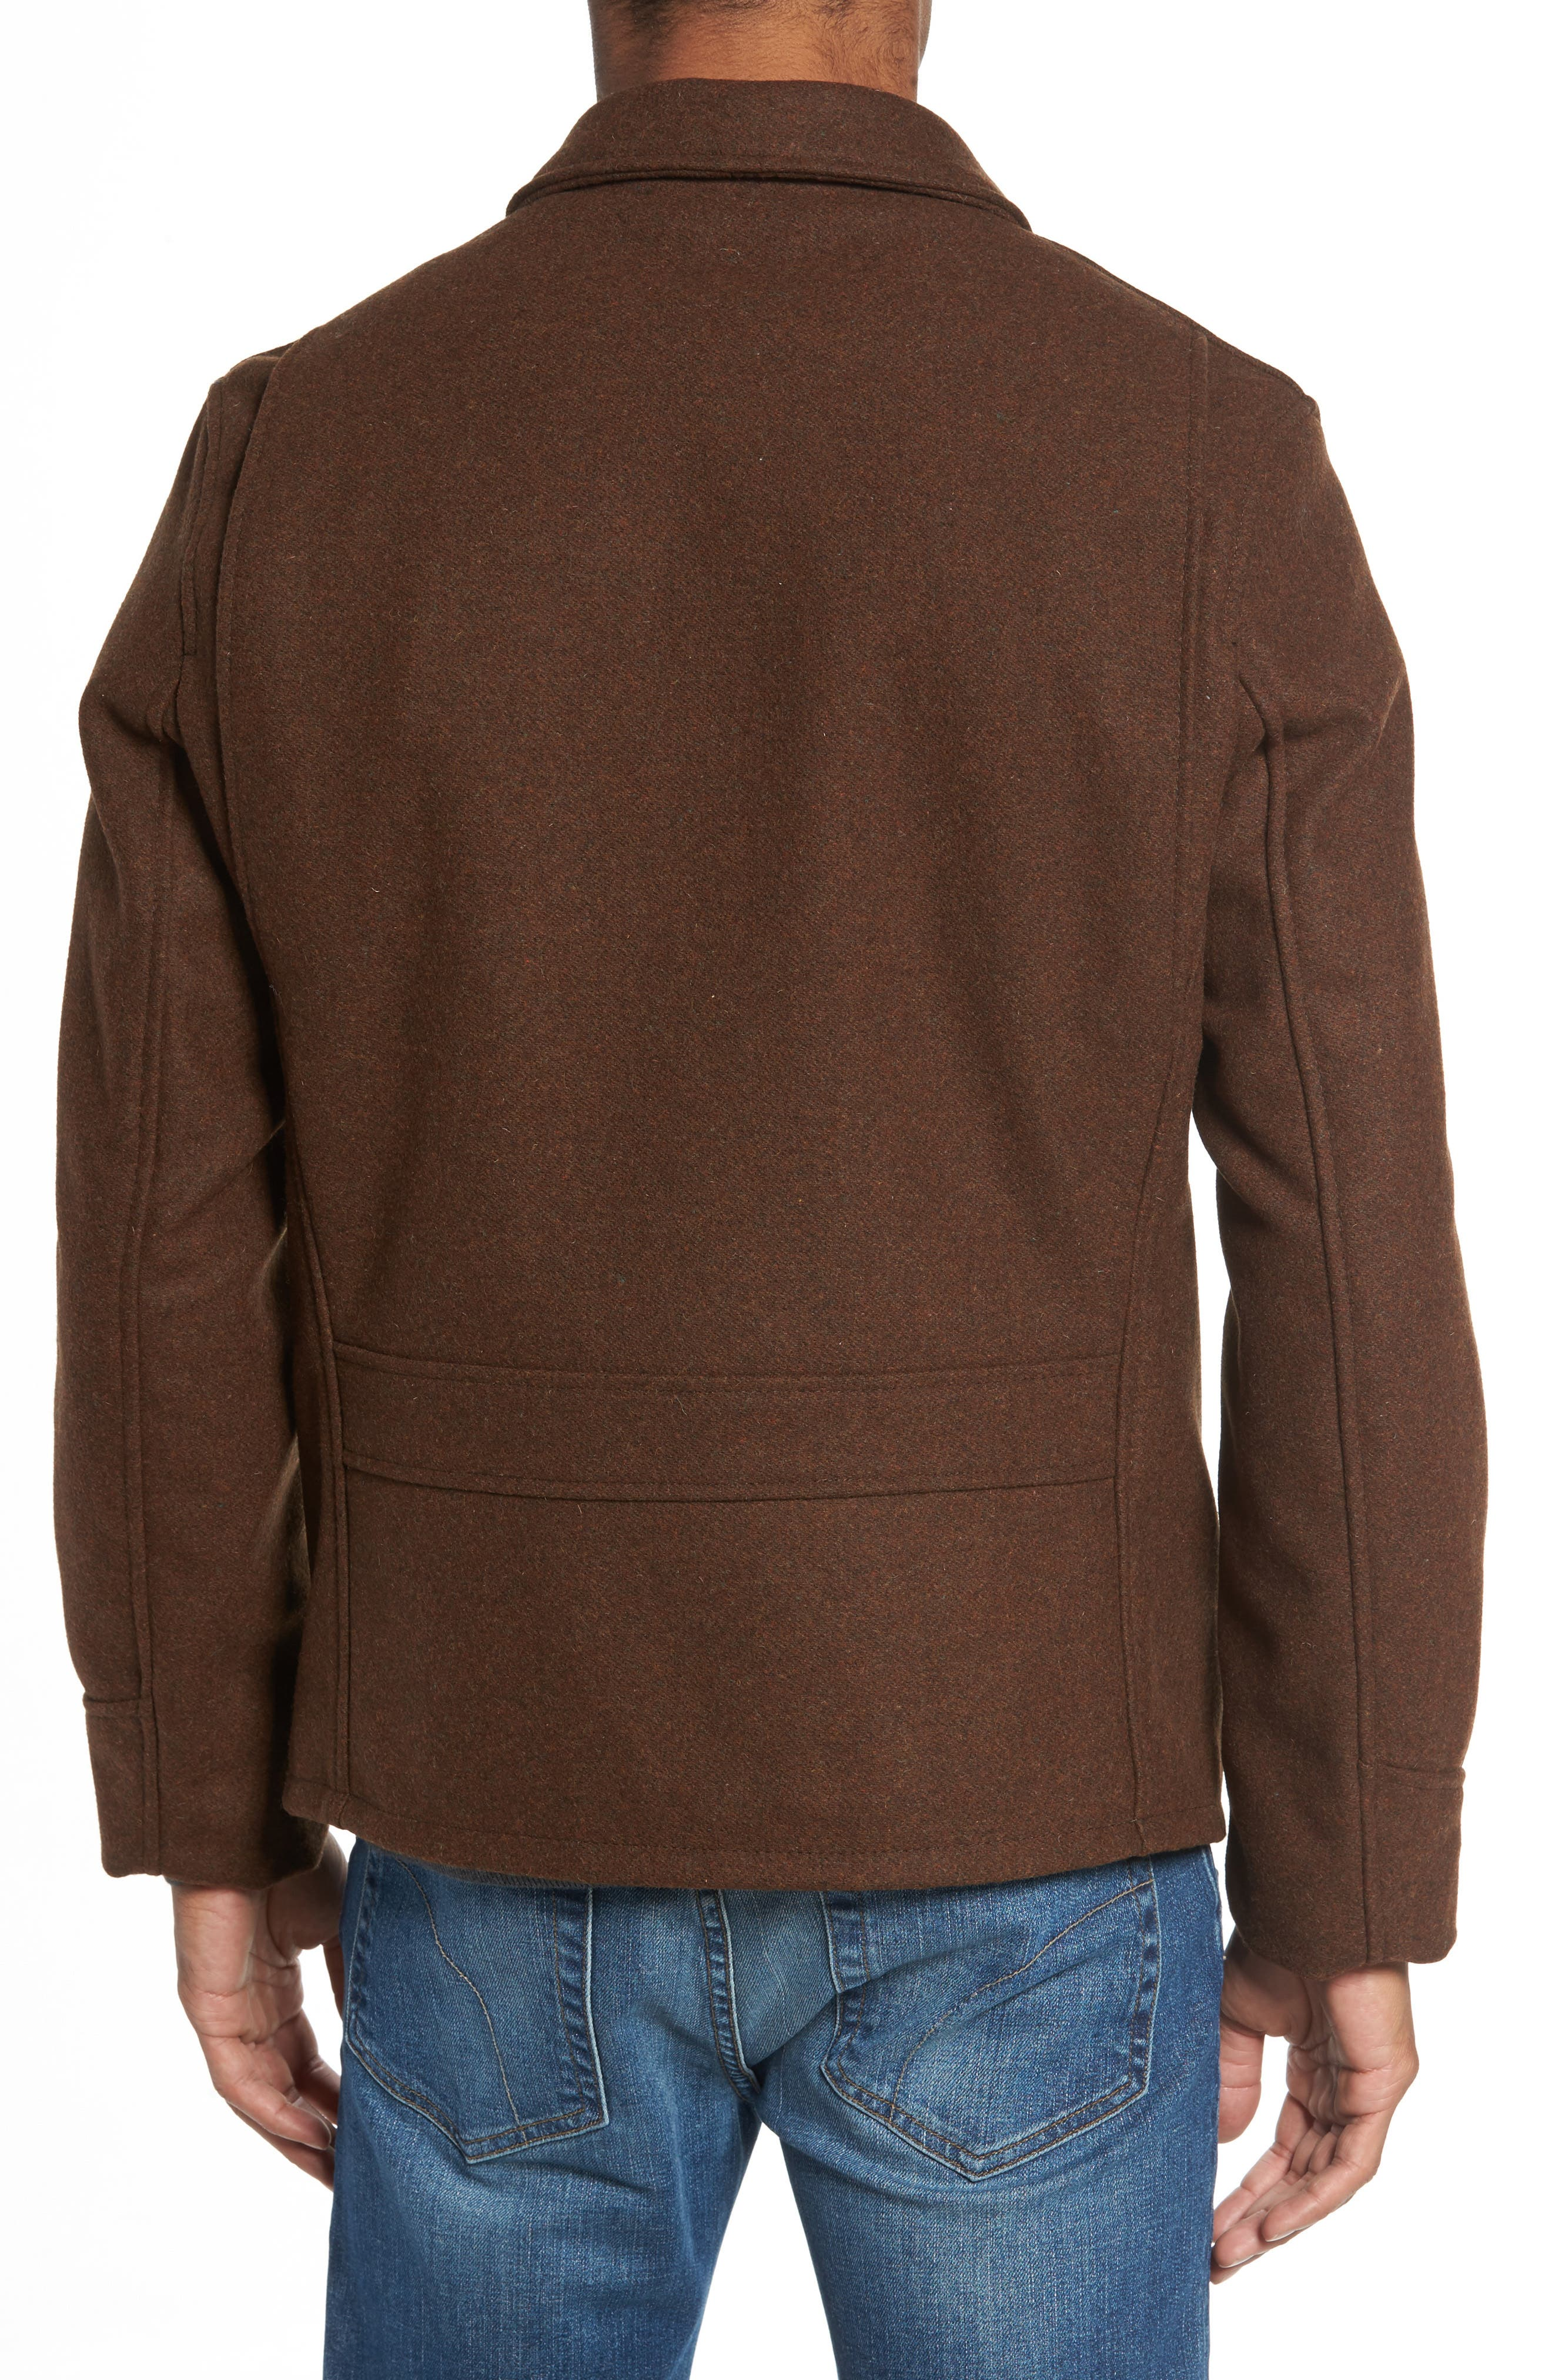 Liberty Wool Blend Zip Front Jacket,                             Alternate thumbnail 2, color,